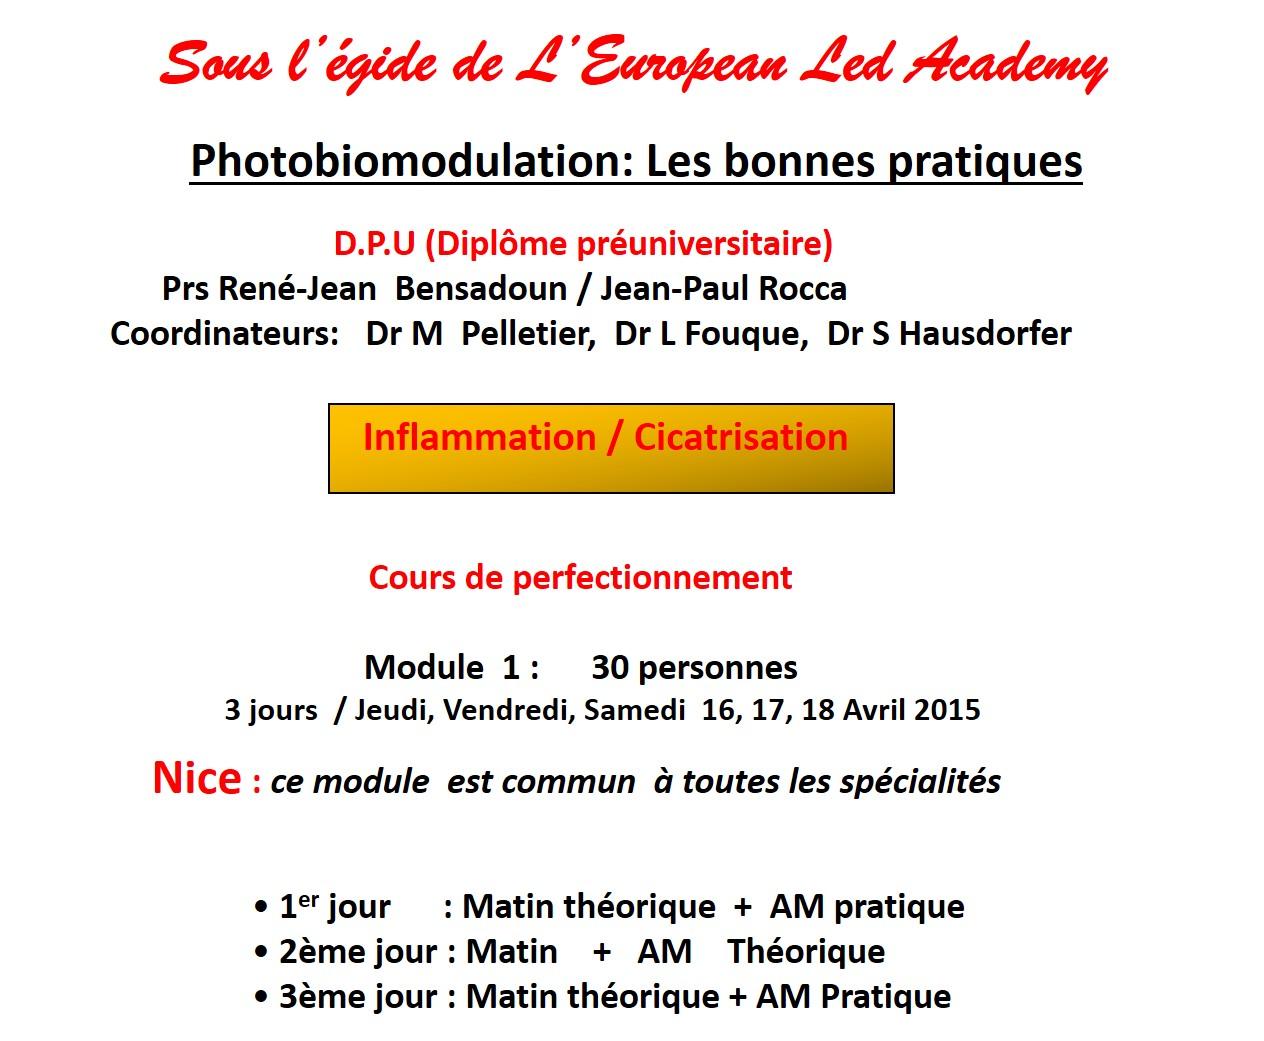 FORMATION  DIU: La Photobiomodulation  (PBM) : Les Bonnes Pratiques.    DIU: Photobiomodulation (PBM) : Good practices.